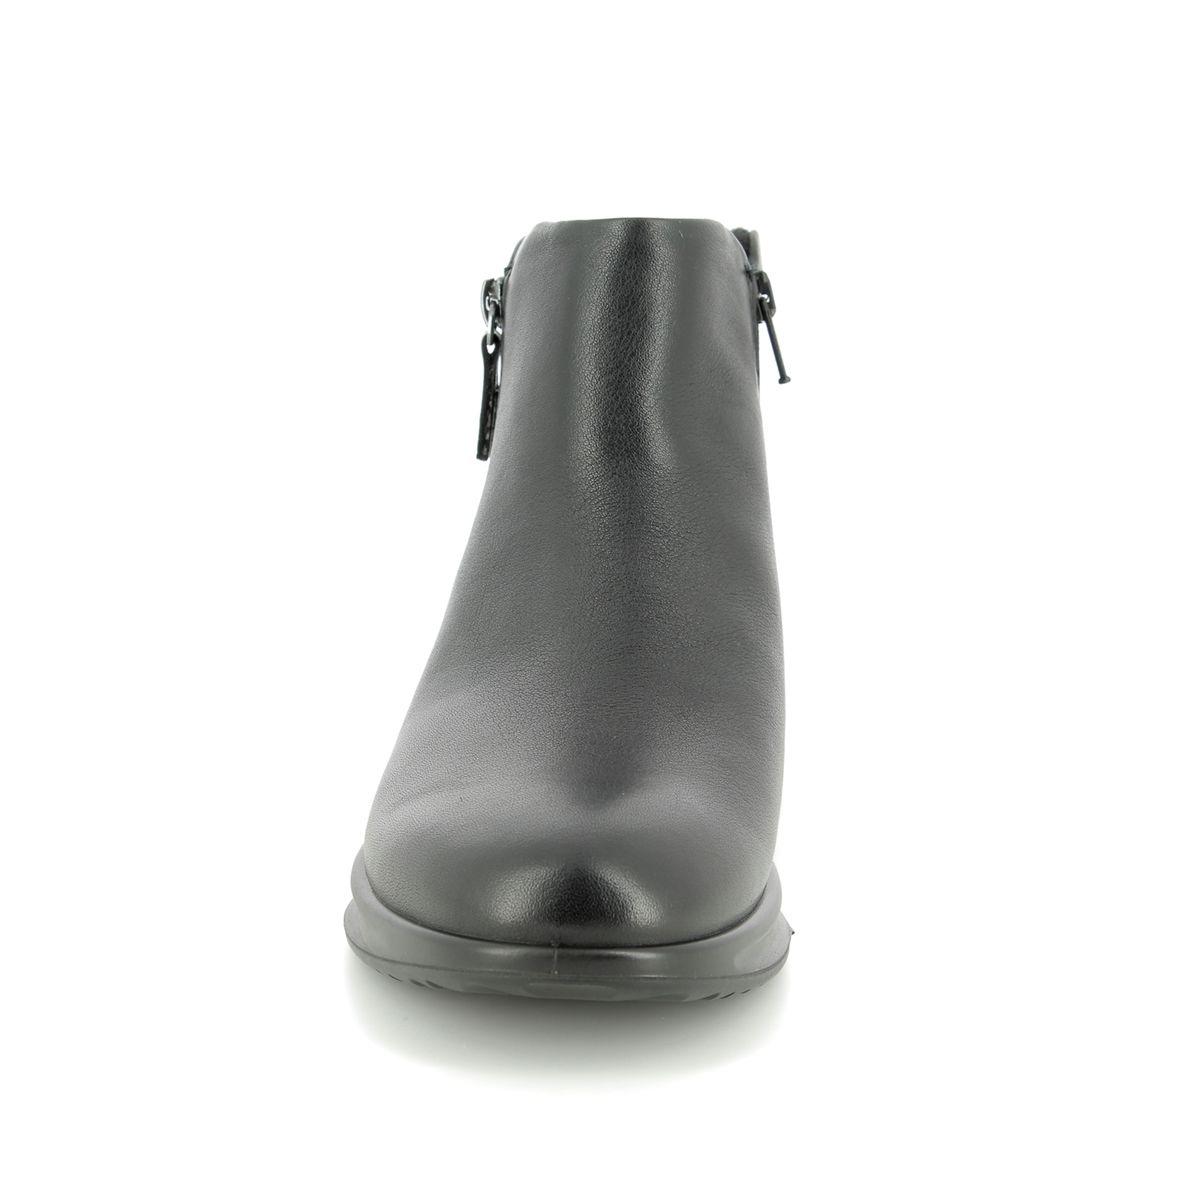 3856aea83 ECCO Ankle Boots - Black leather - 207083/01001 AQUET ZIP GORE-TEX